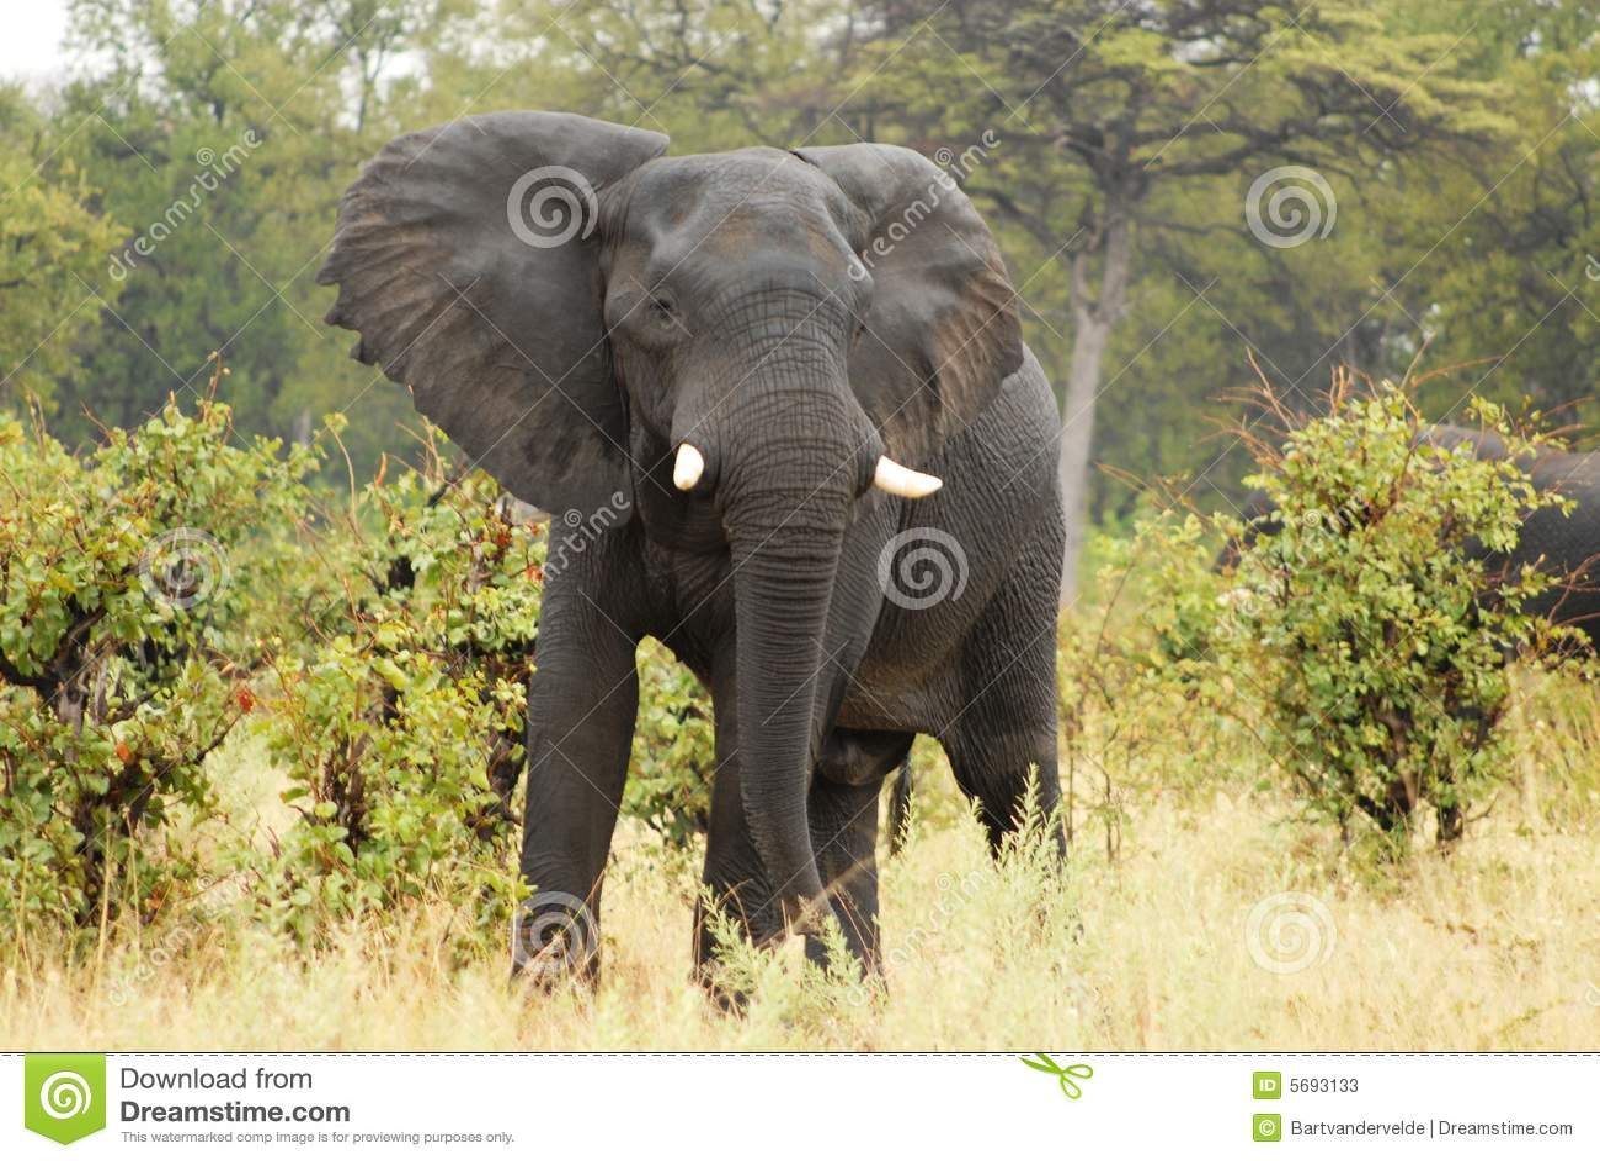 Angry Elephant Stock Photos Image 5693133